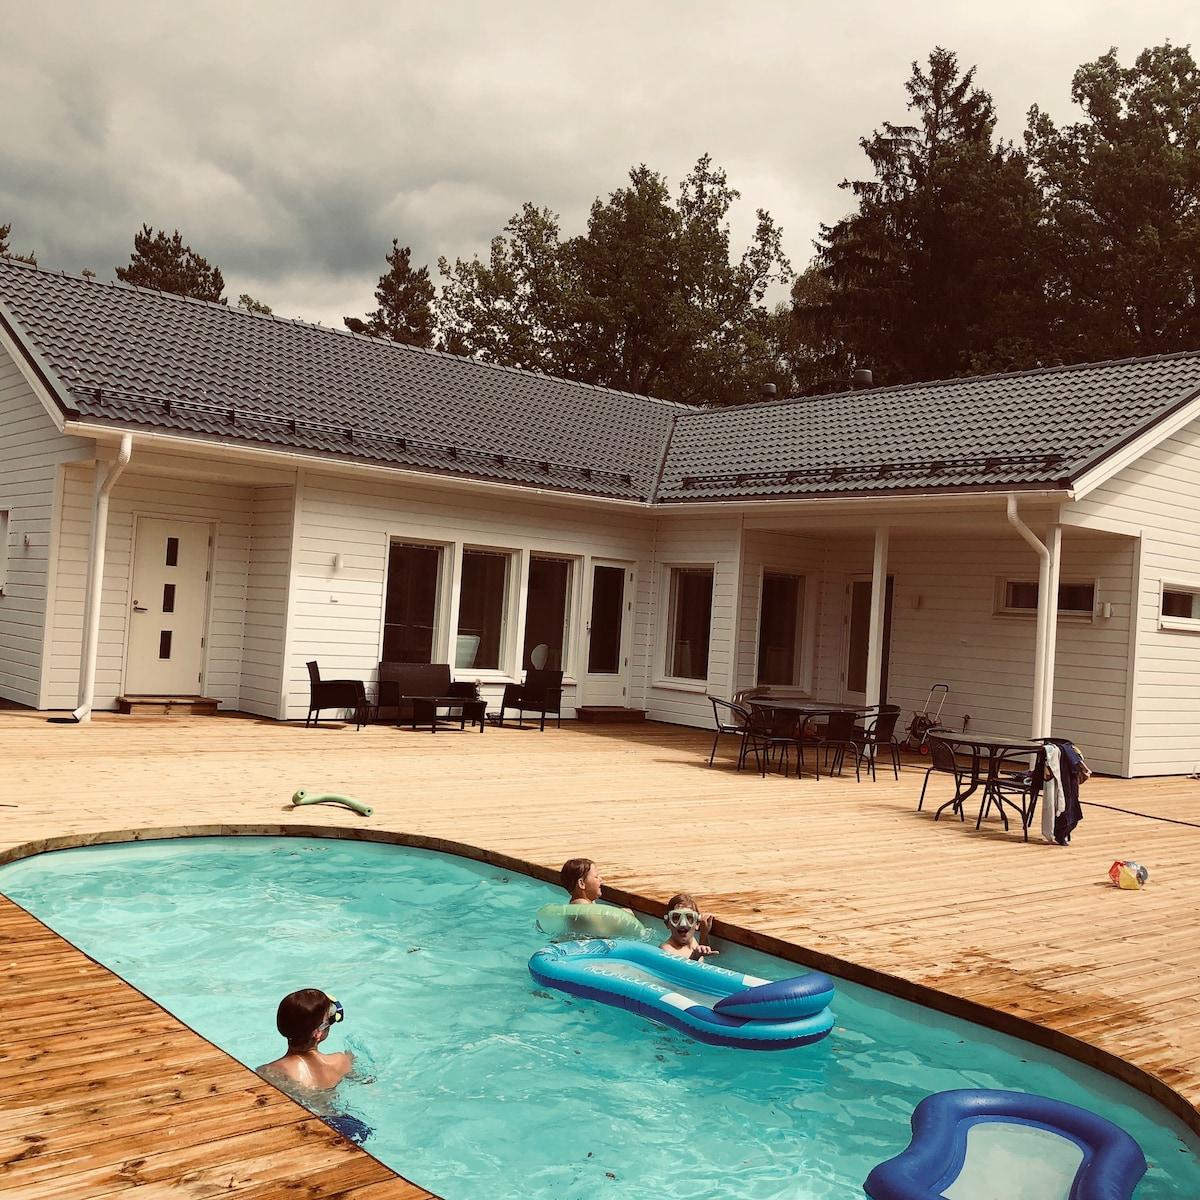 Holiday Villa +warmed pool, saunas+ Hot Tub